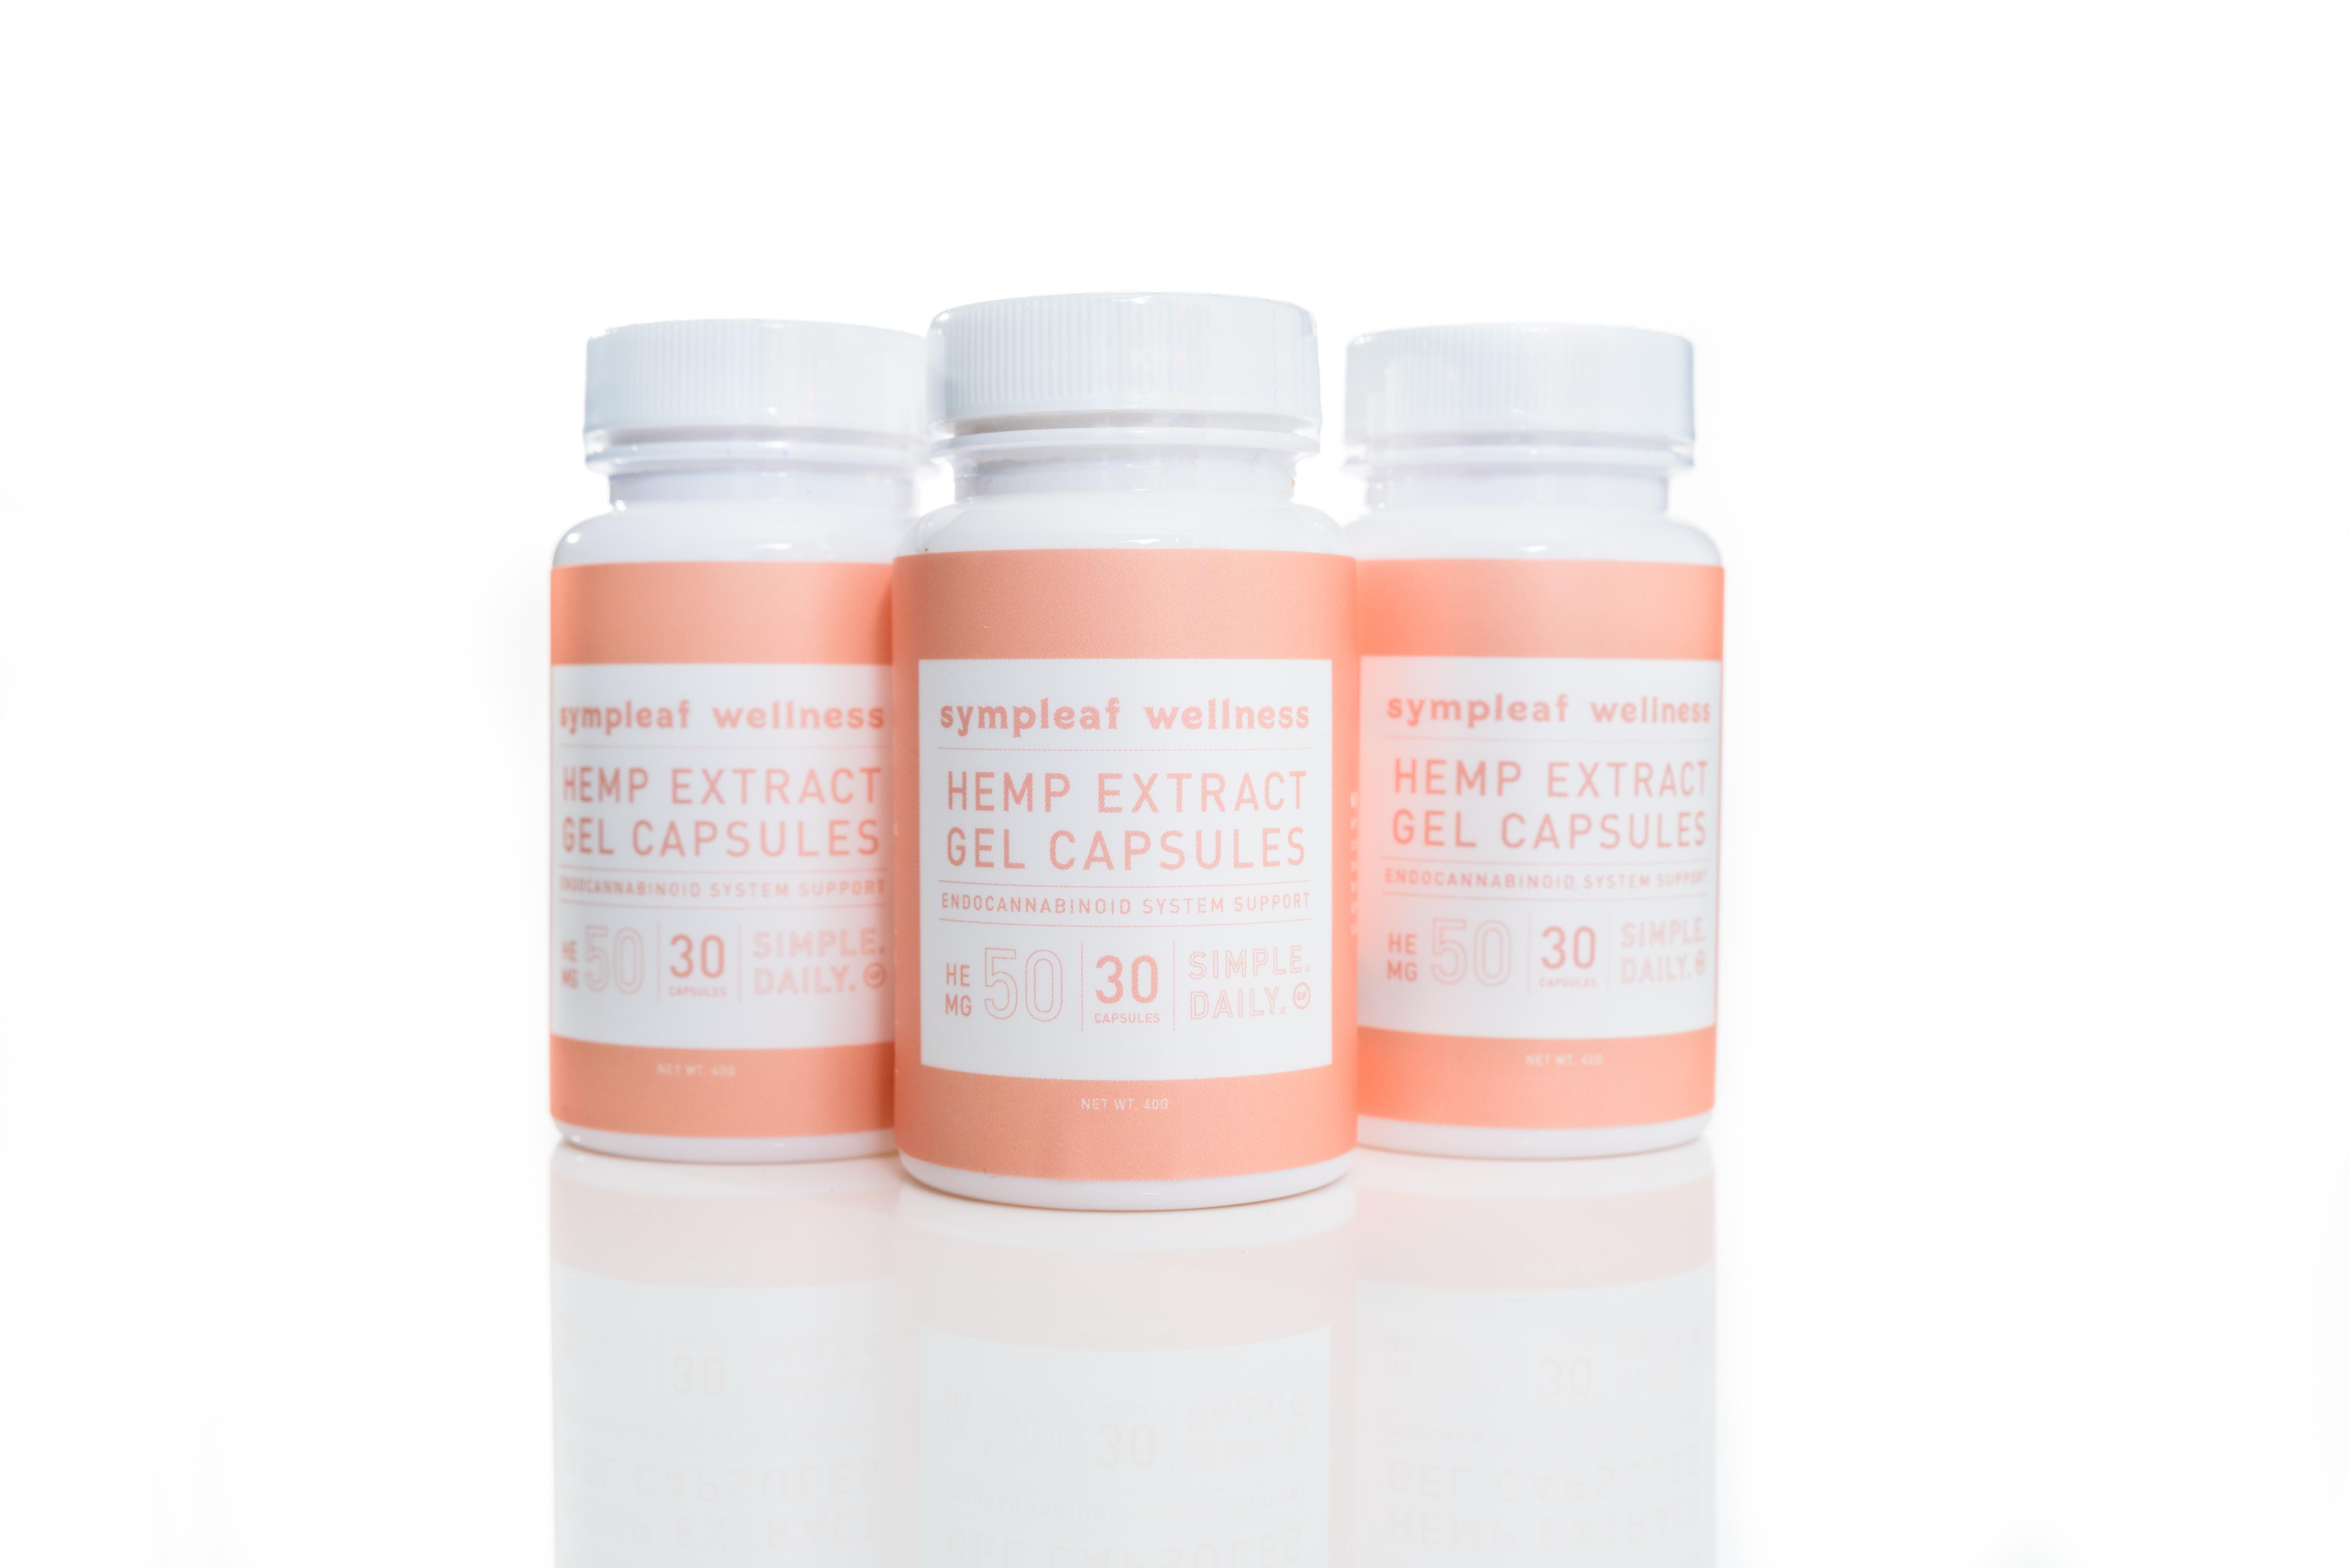 Sympleaf Wellness Hemp Extract Softgels (30ct) 50mg CBD/softgel